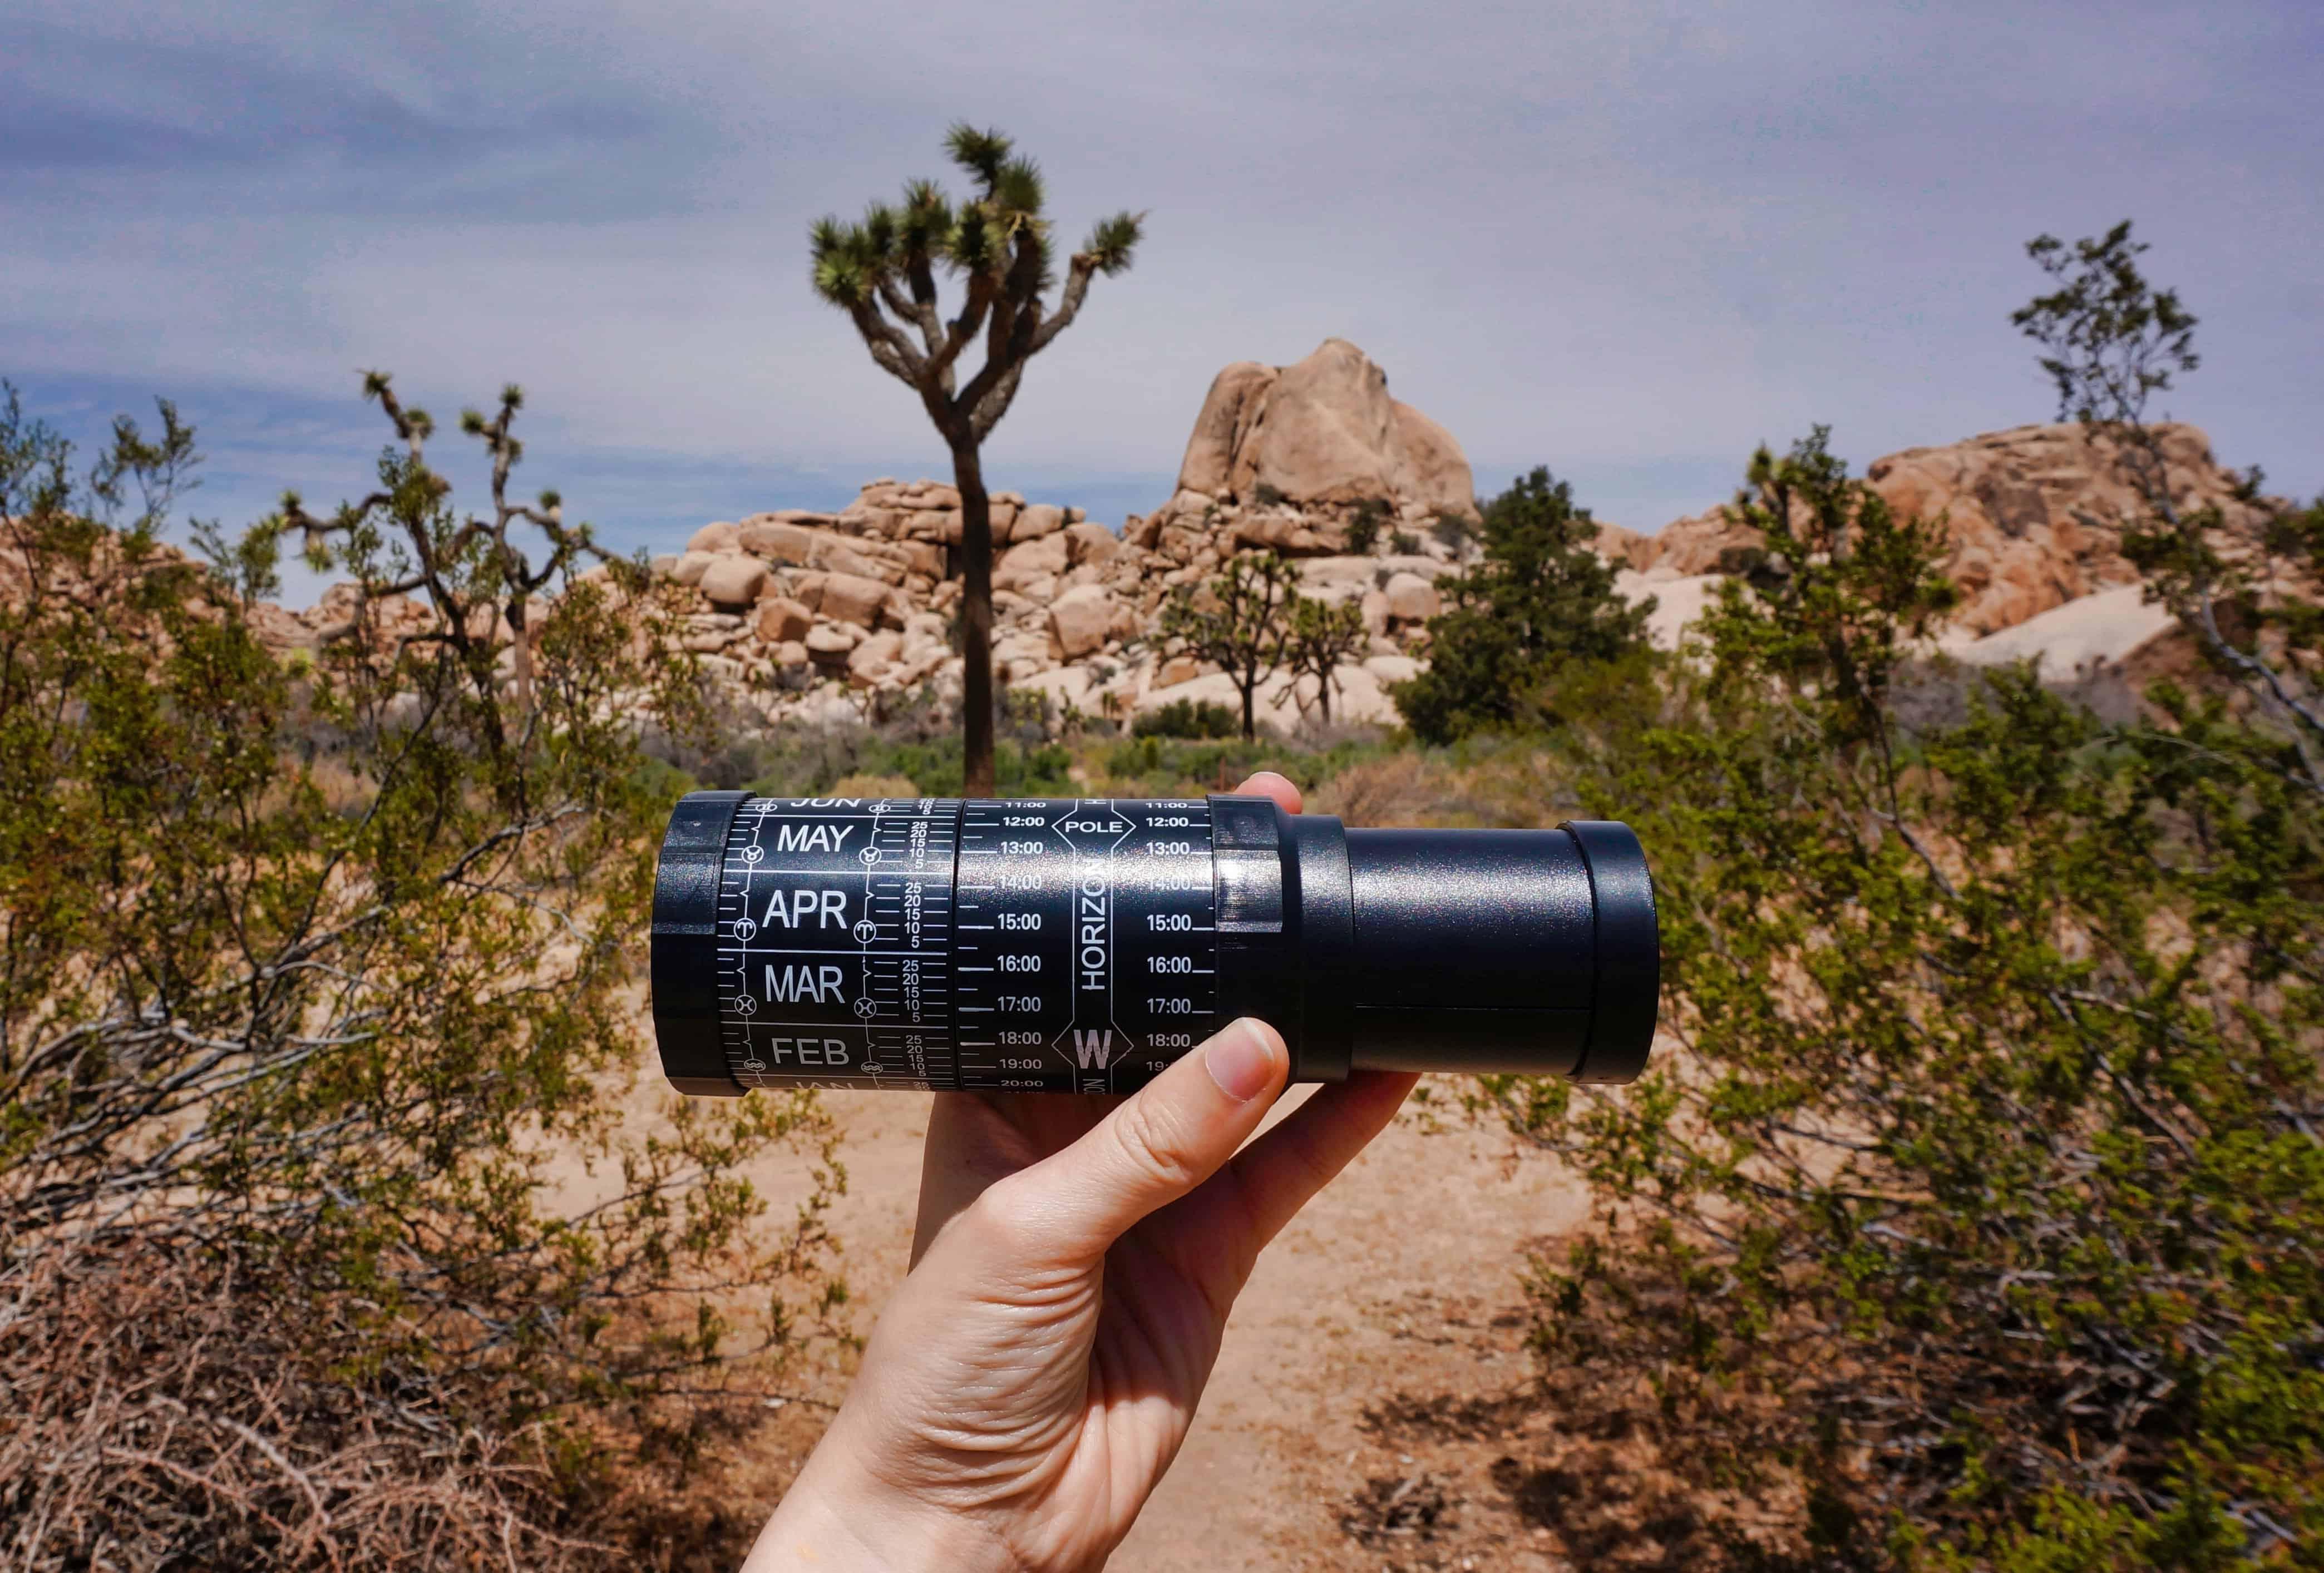 Using a Stellarscope to Prep for Stargazing